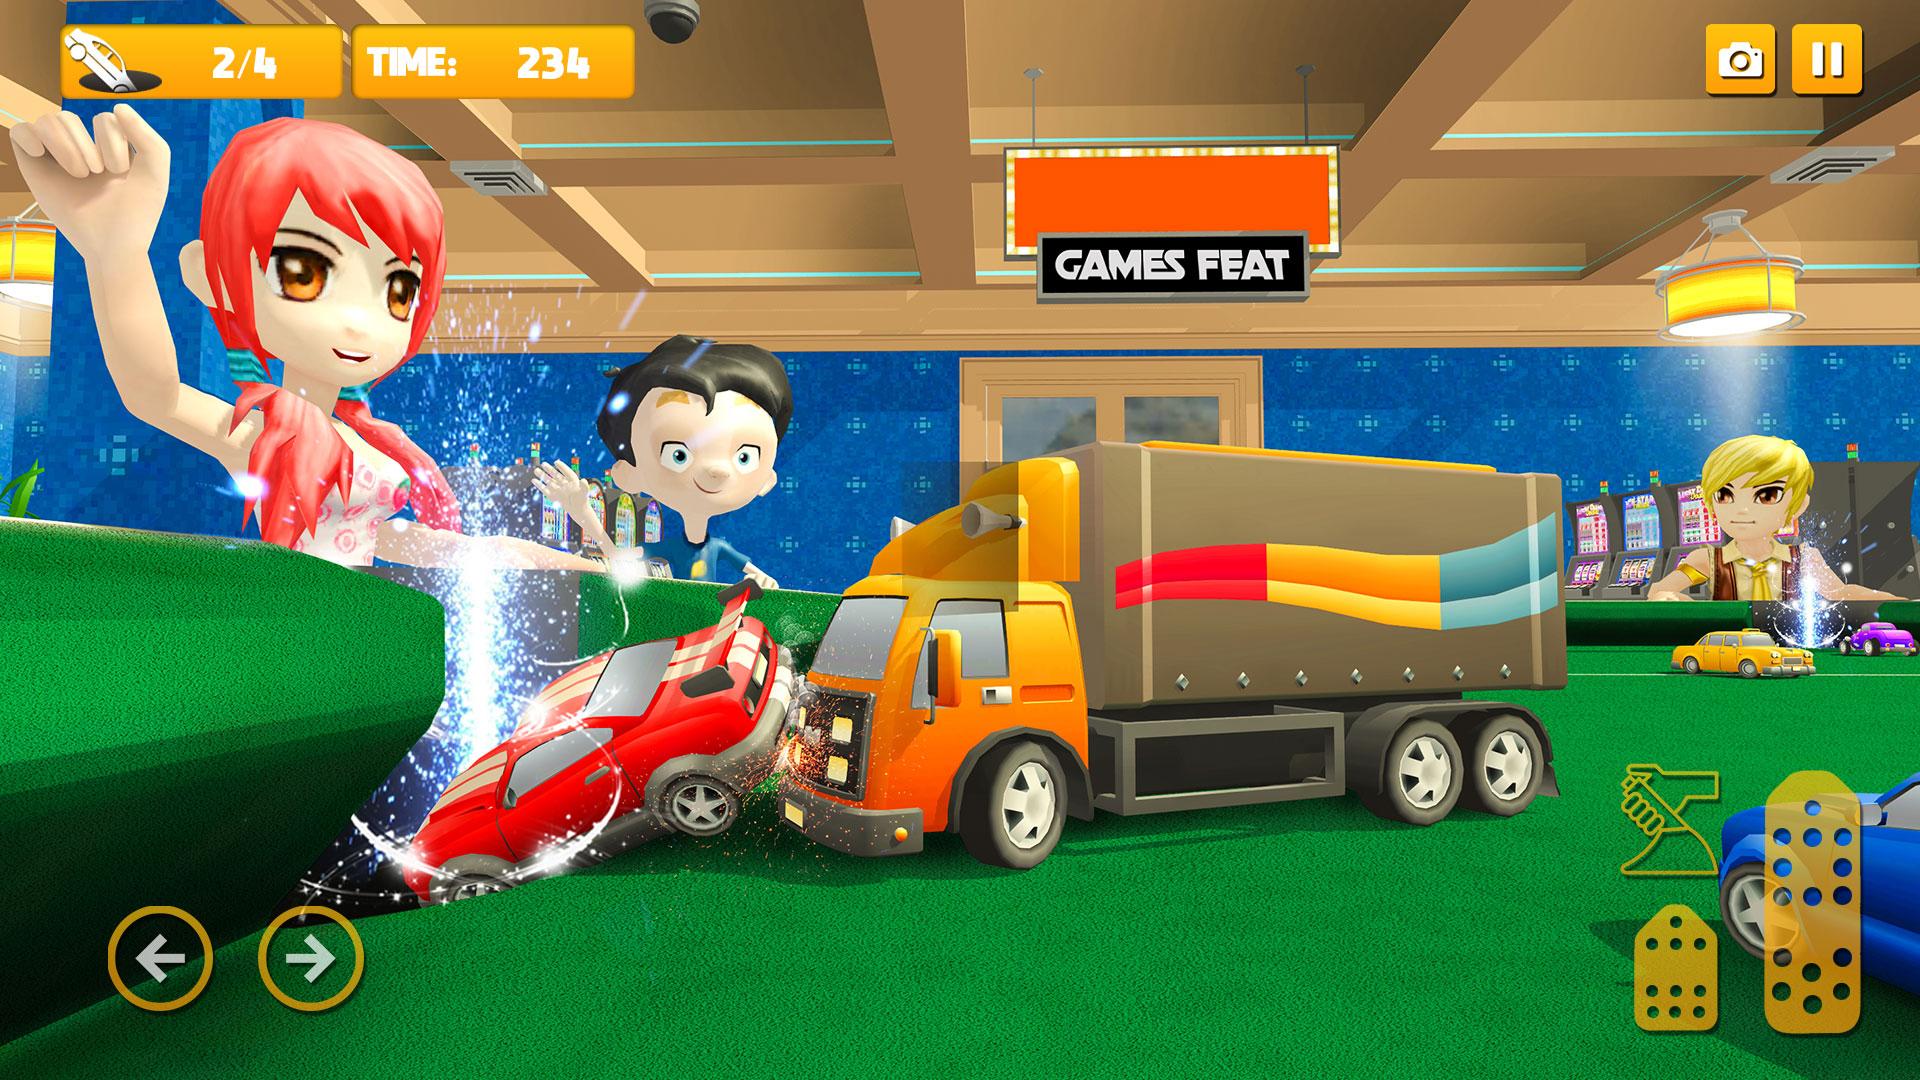 Billares Pool Cars Demolition: RCC Simulation: Amazon.es: Appstore ...